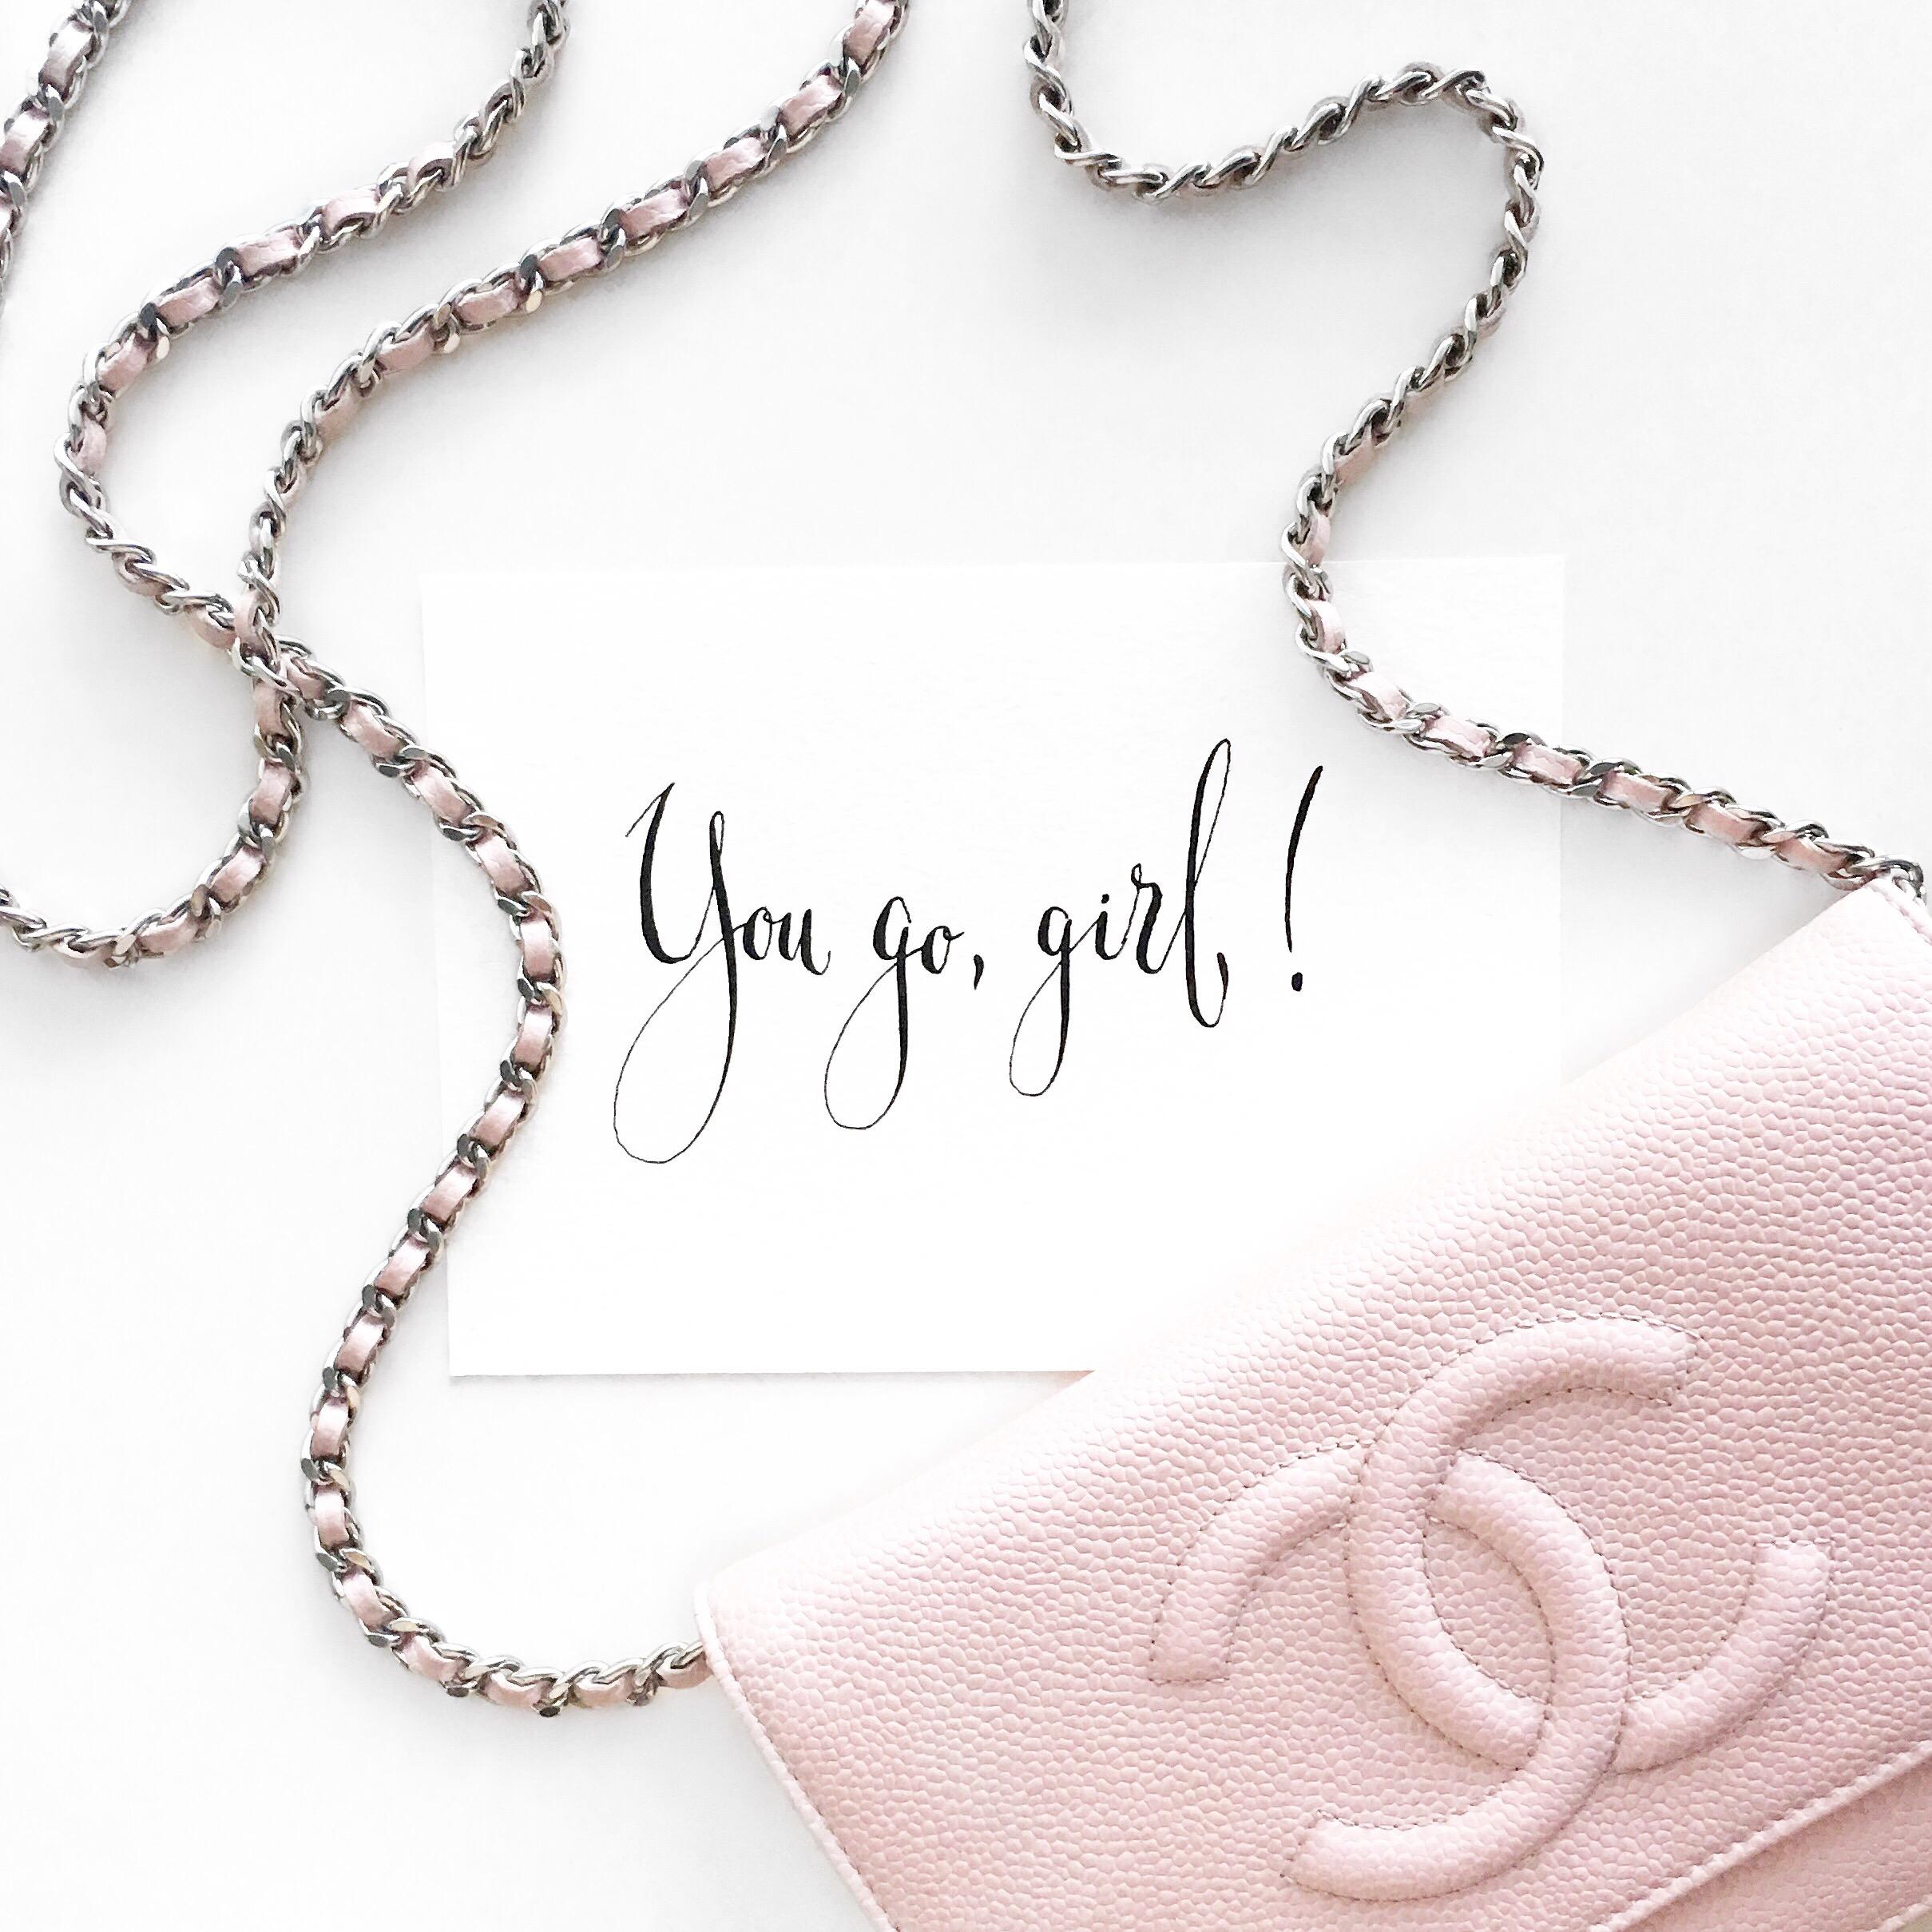 Chanel + You go, girl! + Flatlay